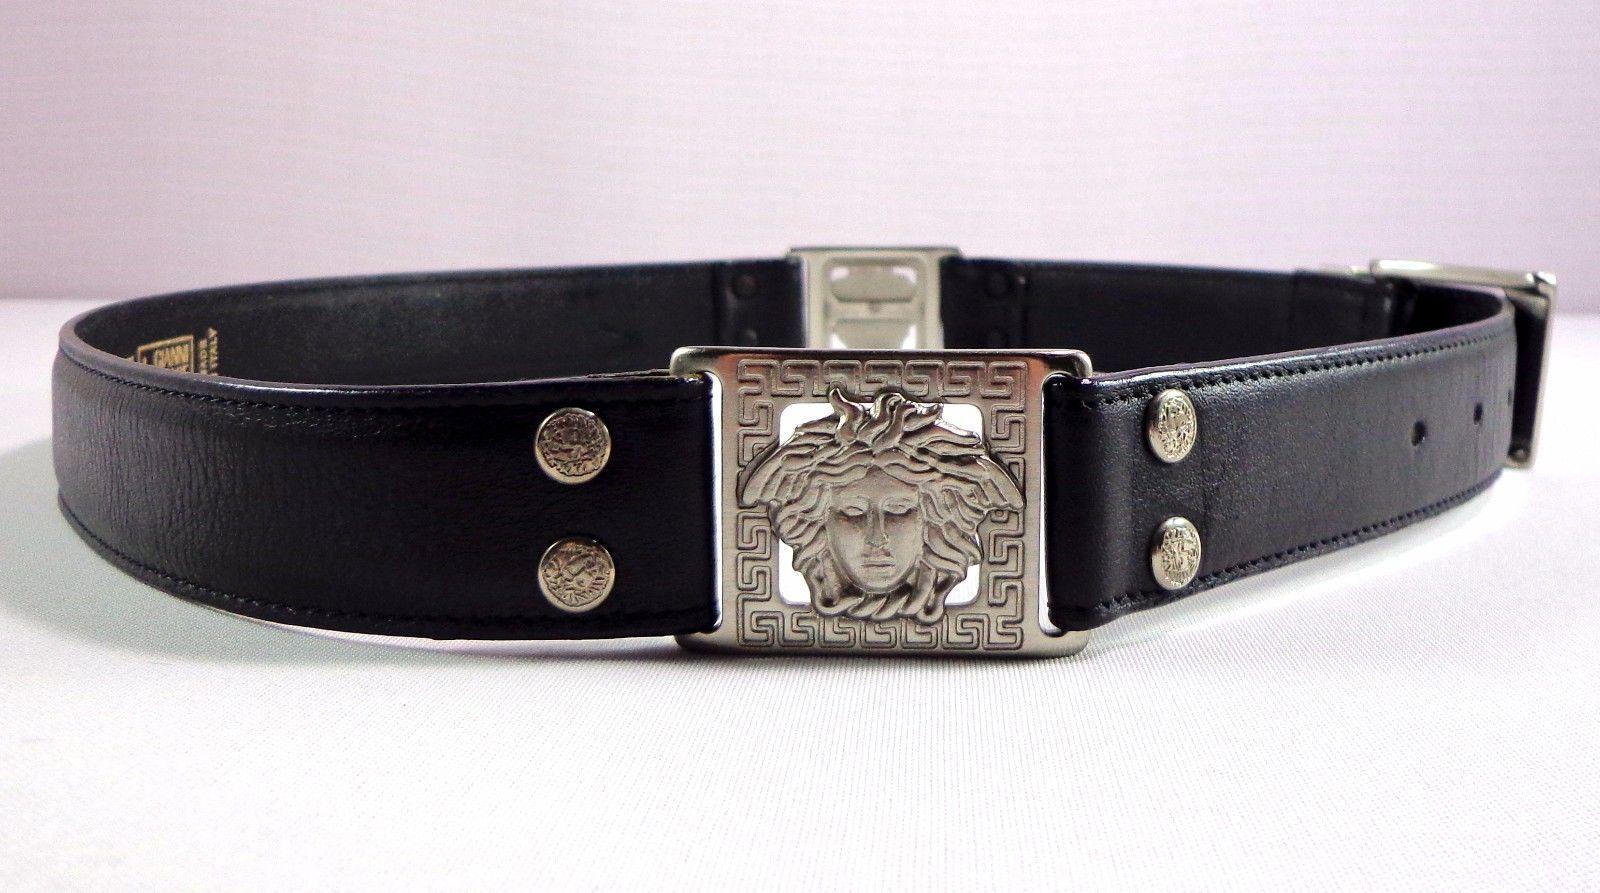 Womens Vintage Gianni Versace Medusa Black Leather Belt Size 75 / 30 Italy